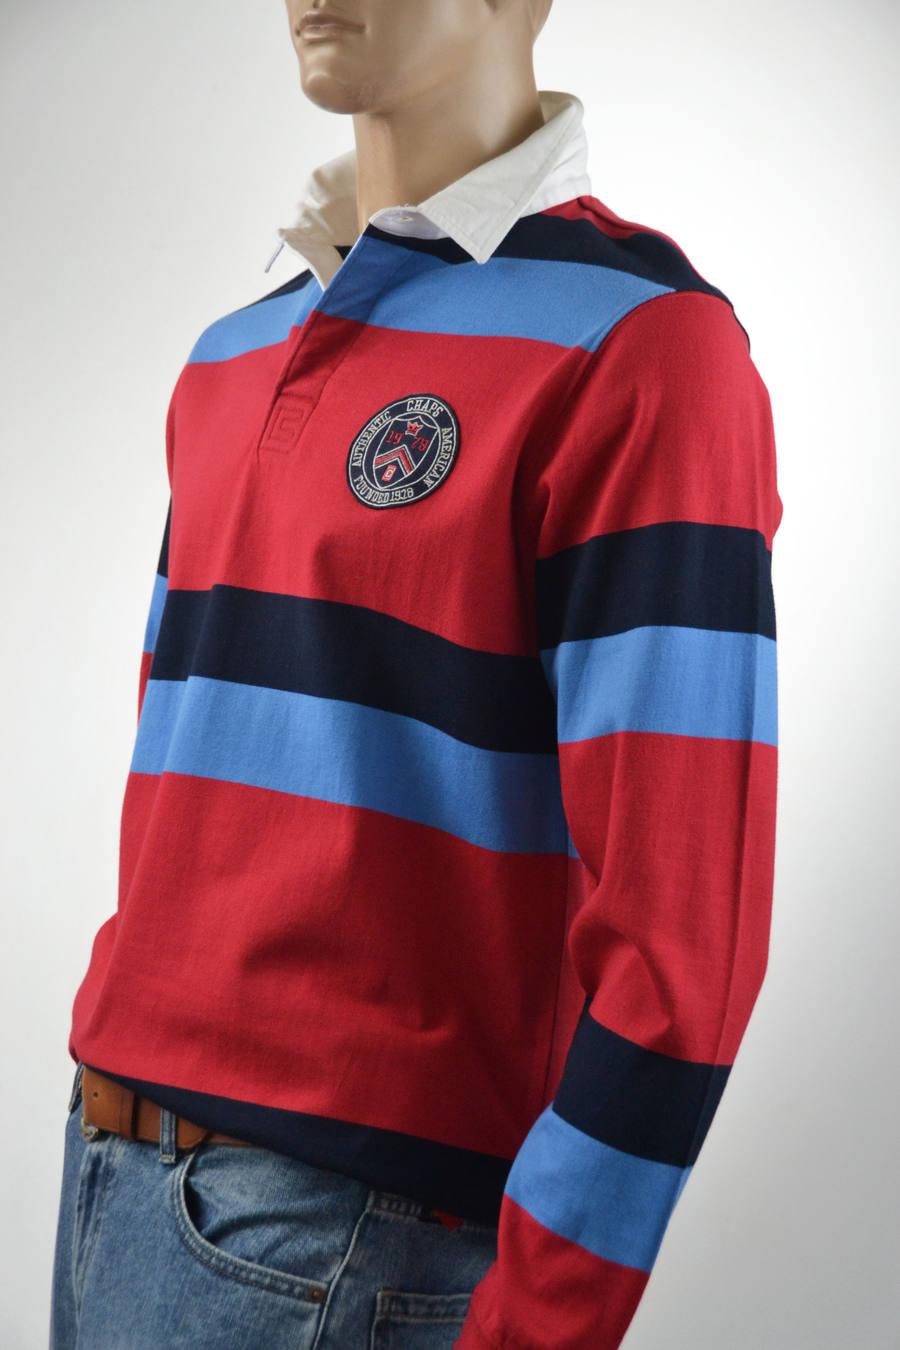 Chaps Mens Rugby Rednavy Blue Striped Long Sleeve Shirt Medium